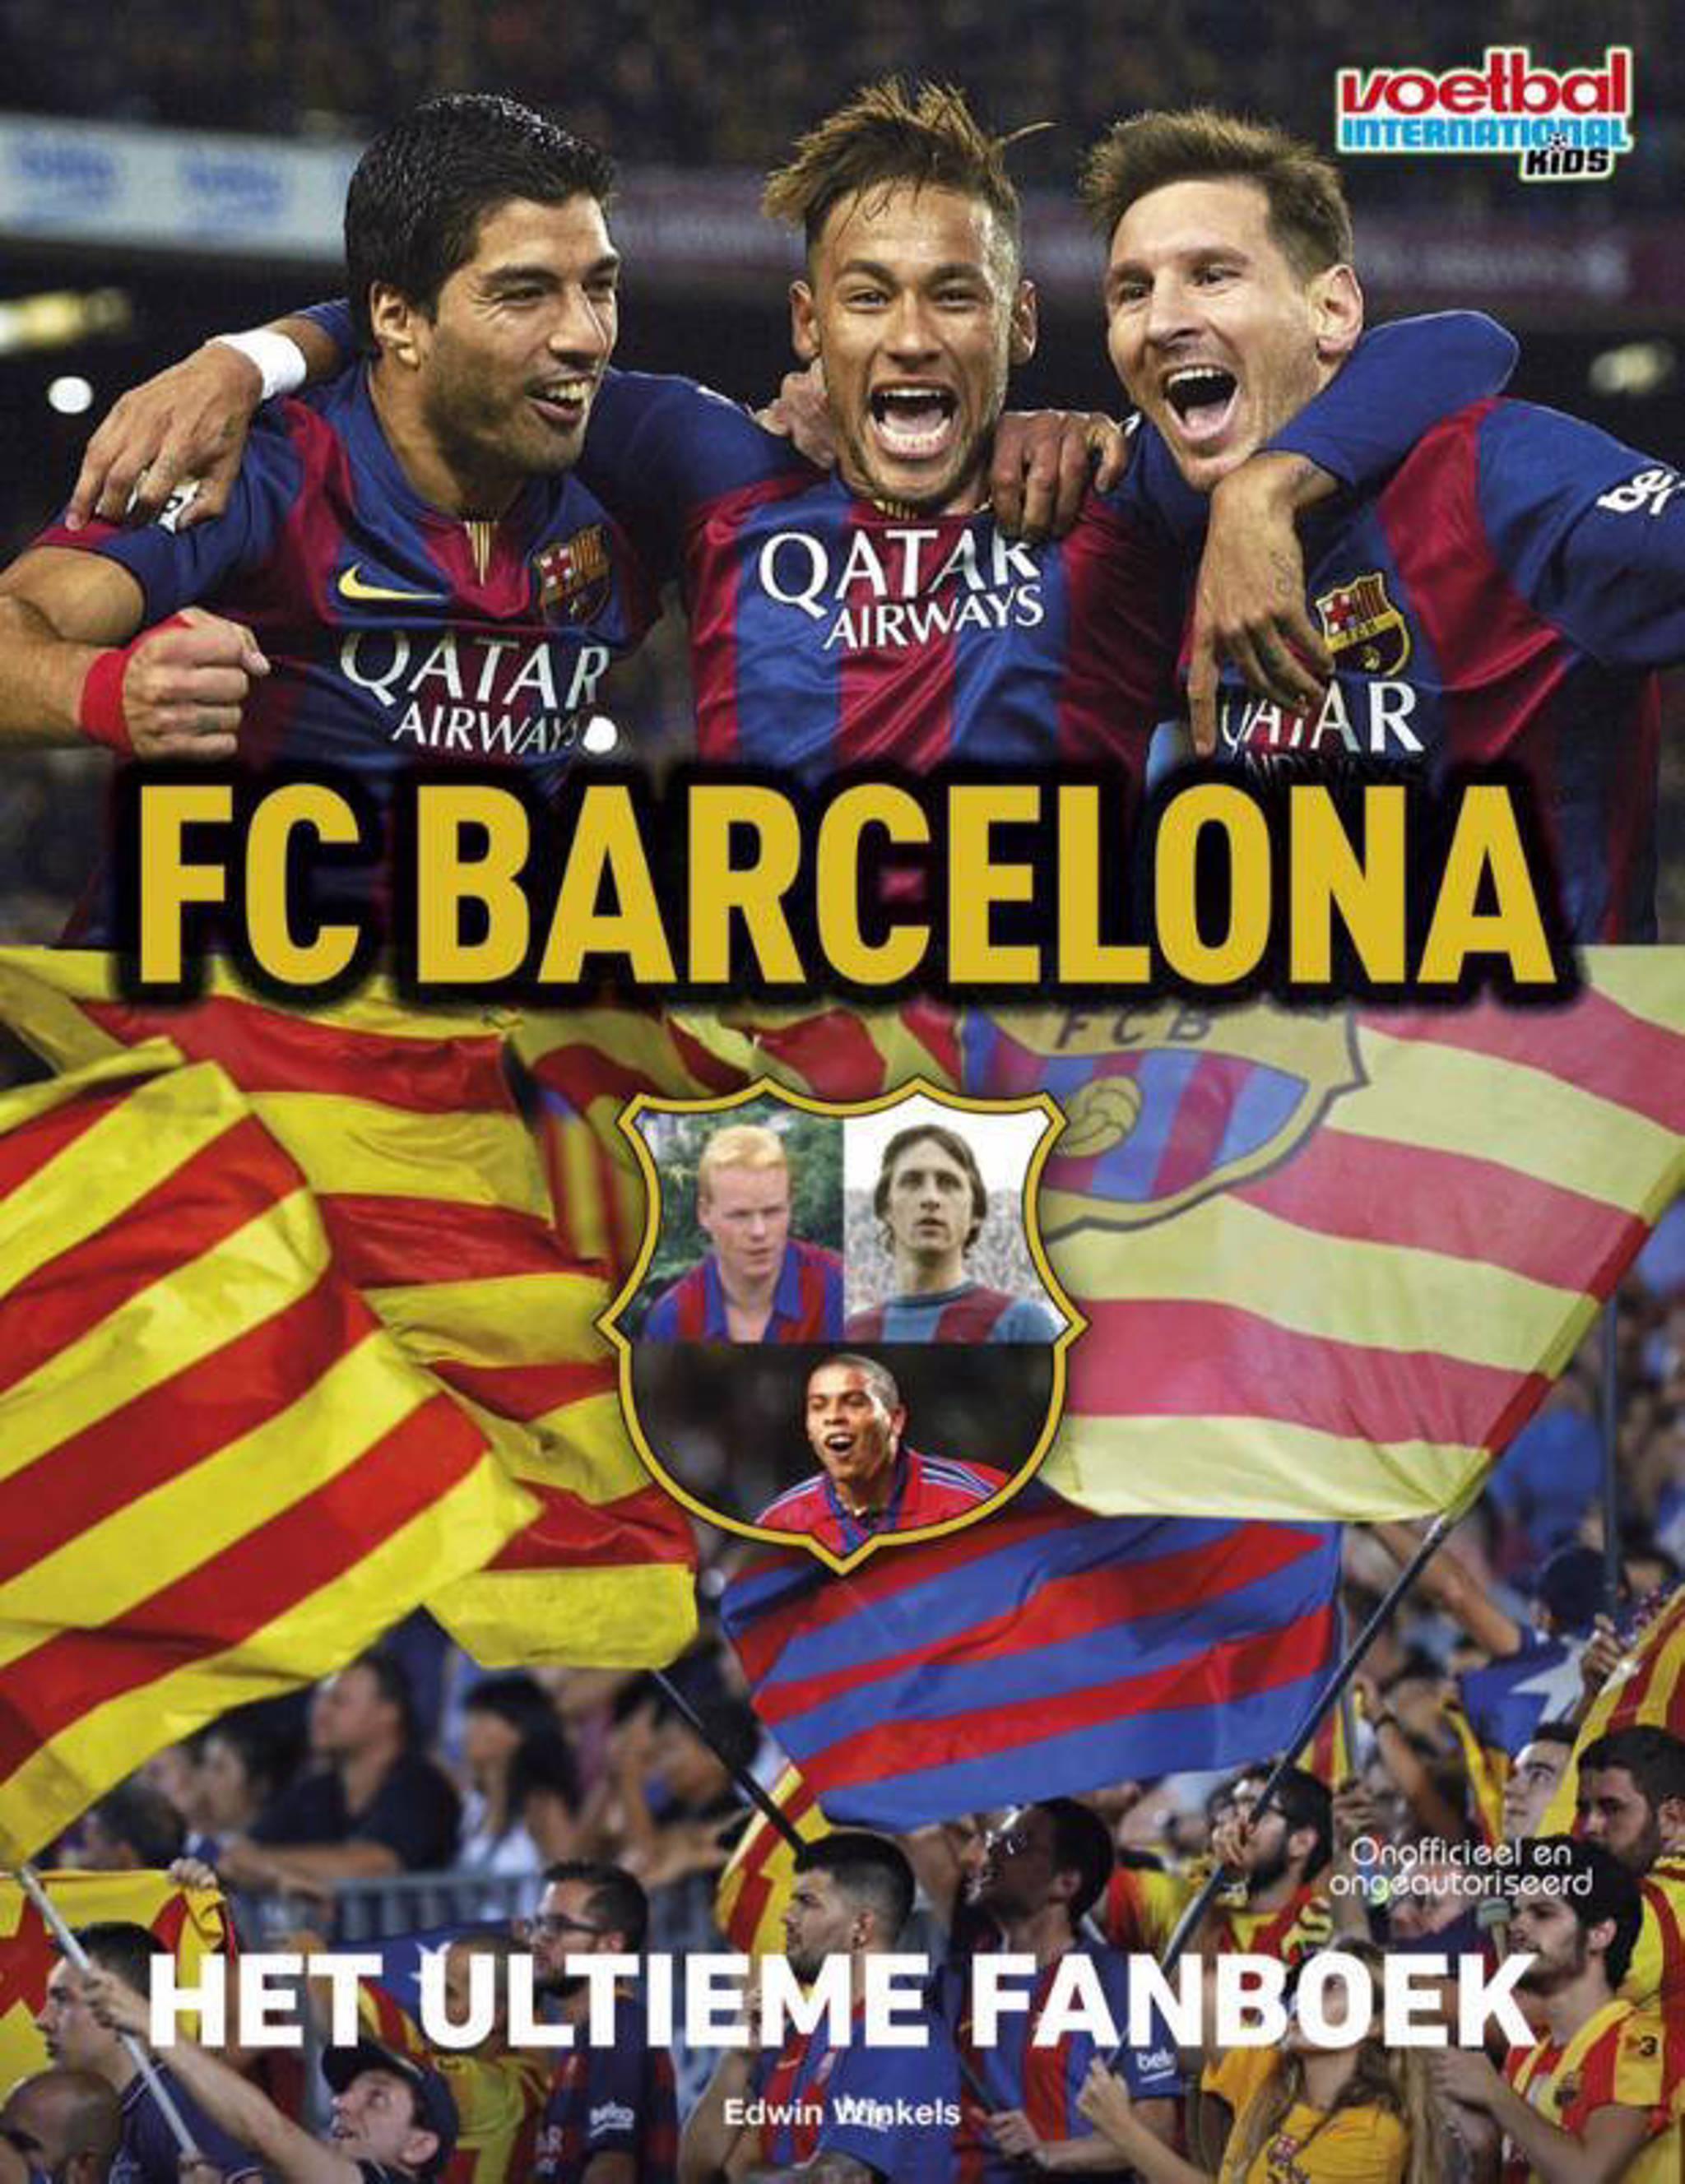 Zitzak Fc Barcelona.Edwin Winkels Fc Barcelona Wehkamp